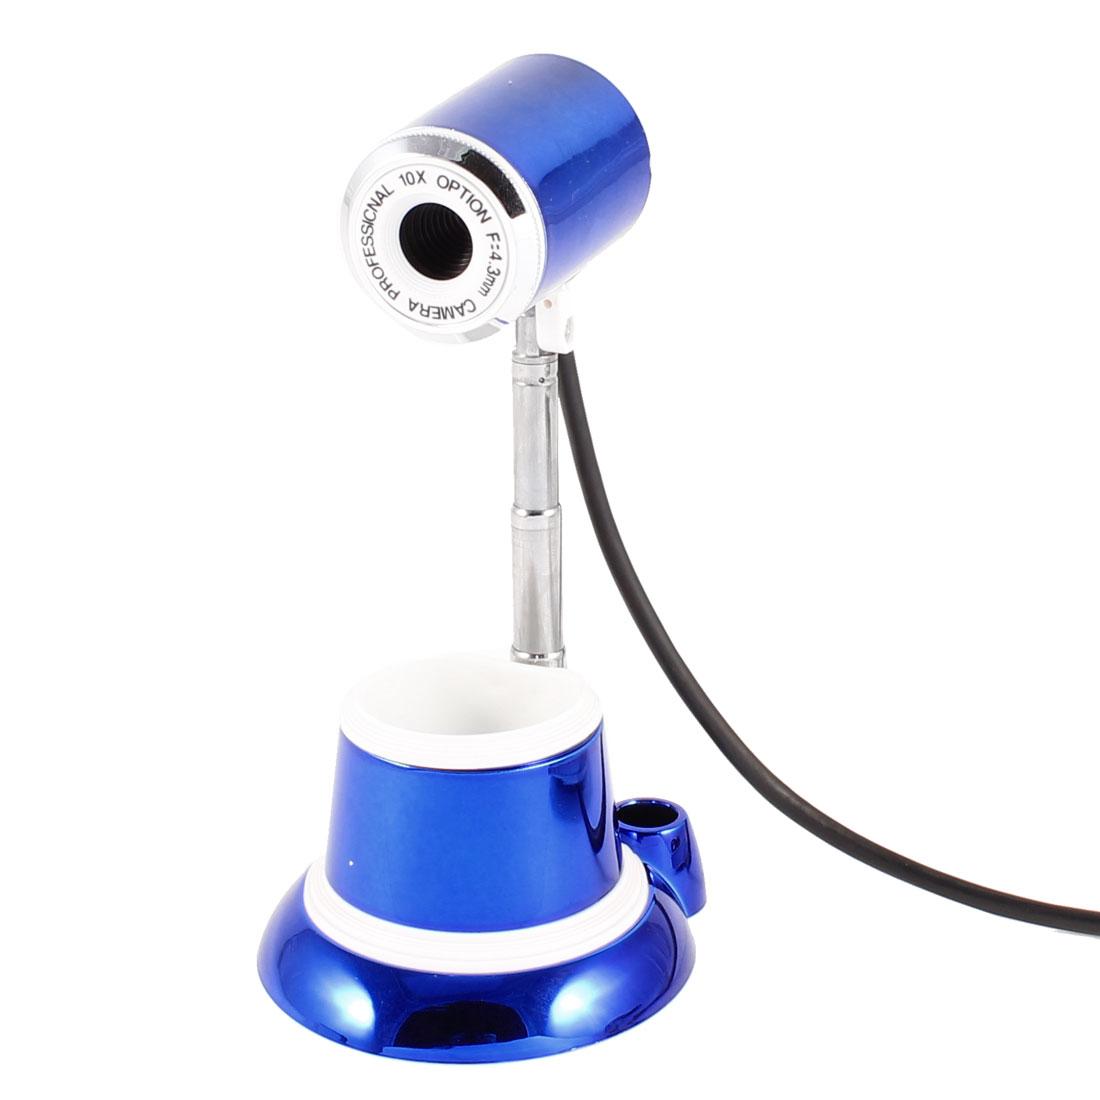 Tower Shape 1004x1004 10 Mega Pixels Camera USB2.0 MIC Webcam Blue for PC